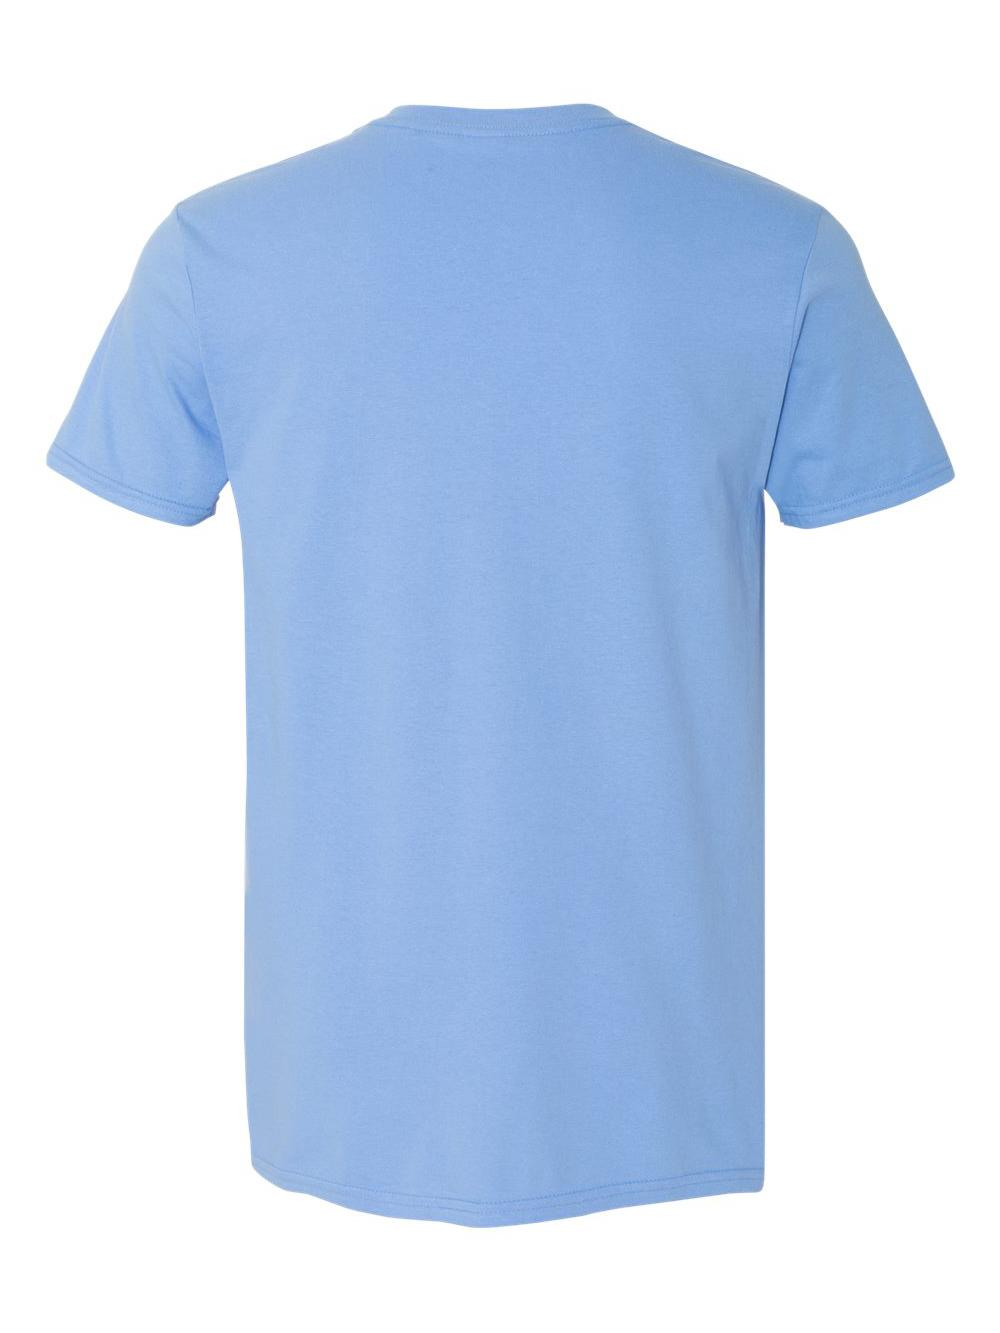 Gildan-Softstyle-T-Shirt-64000 thumbnail 28